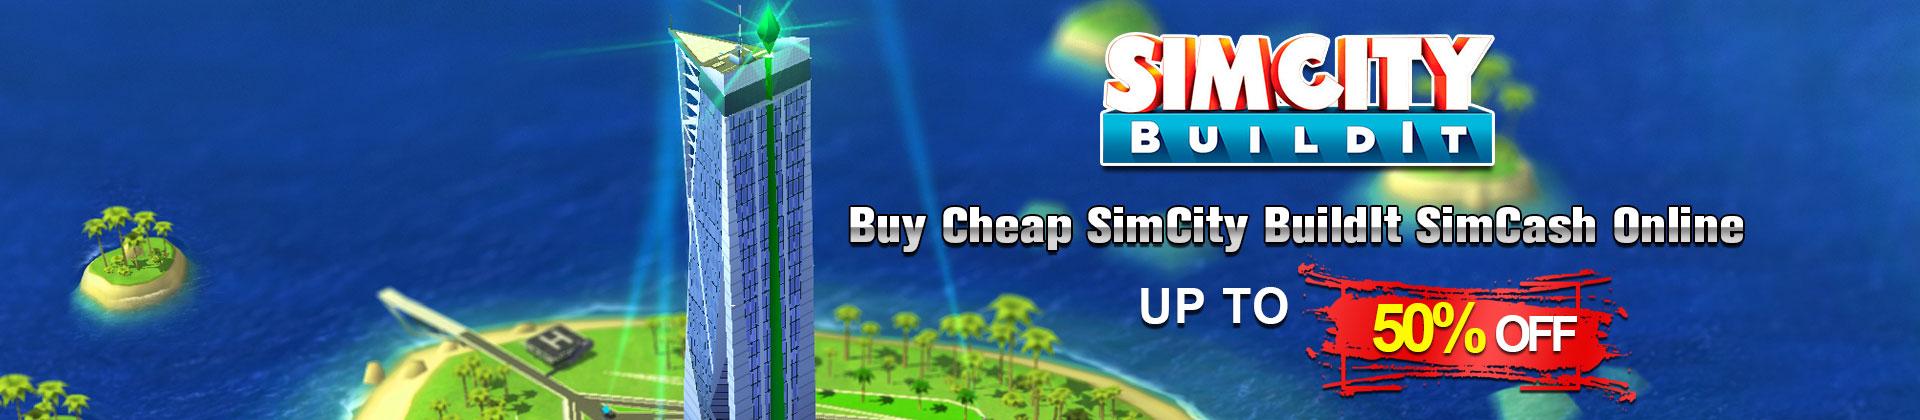 Buy SimCity BuildIt SimCash